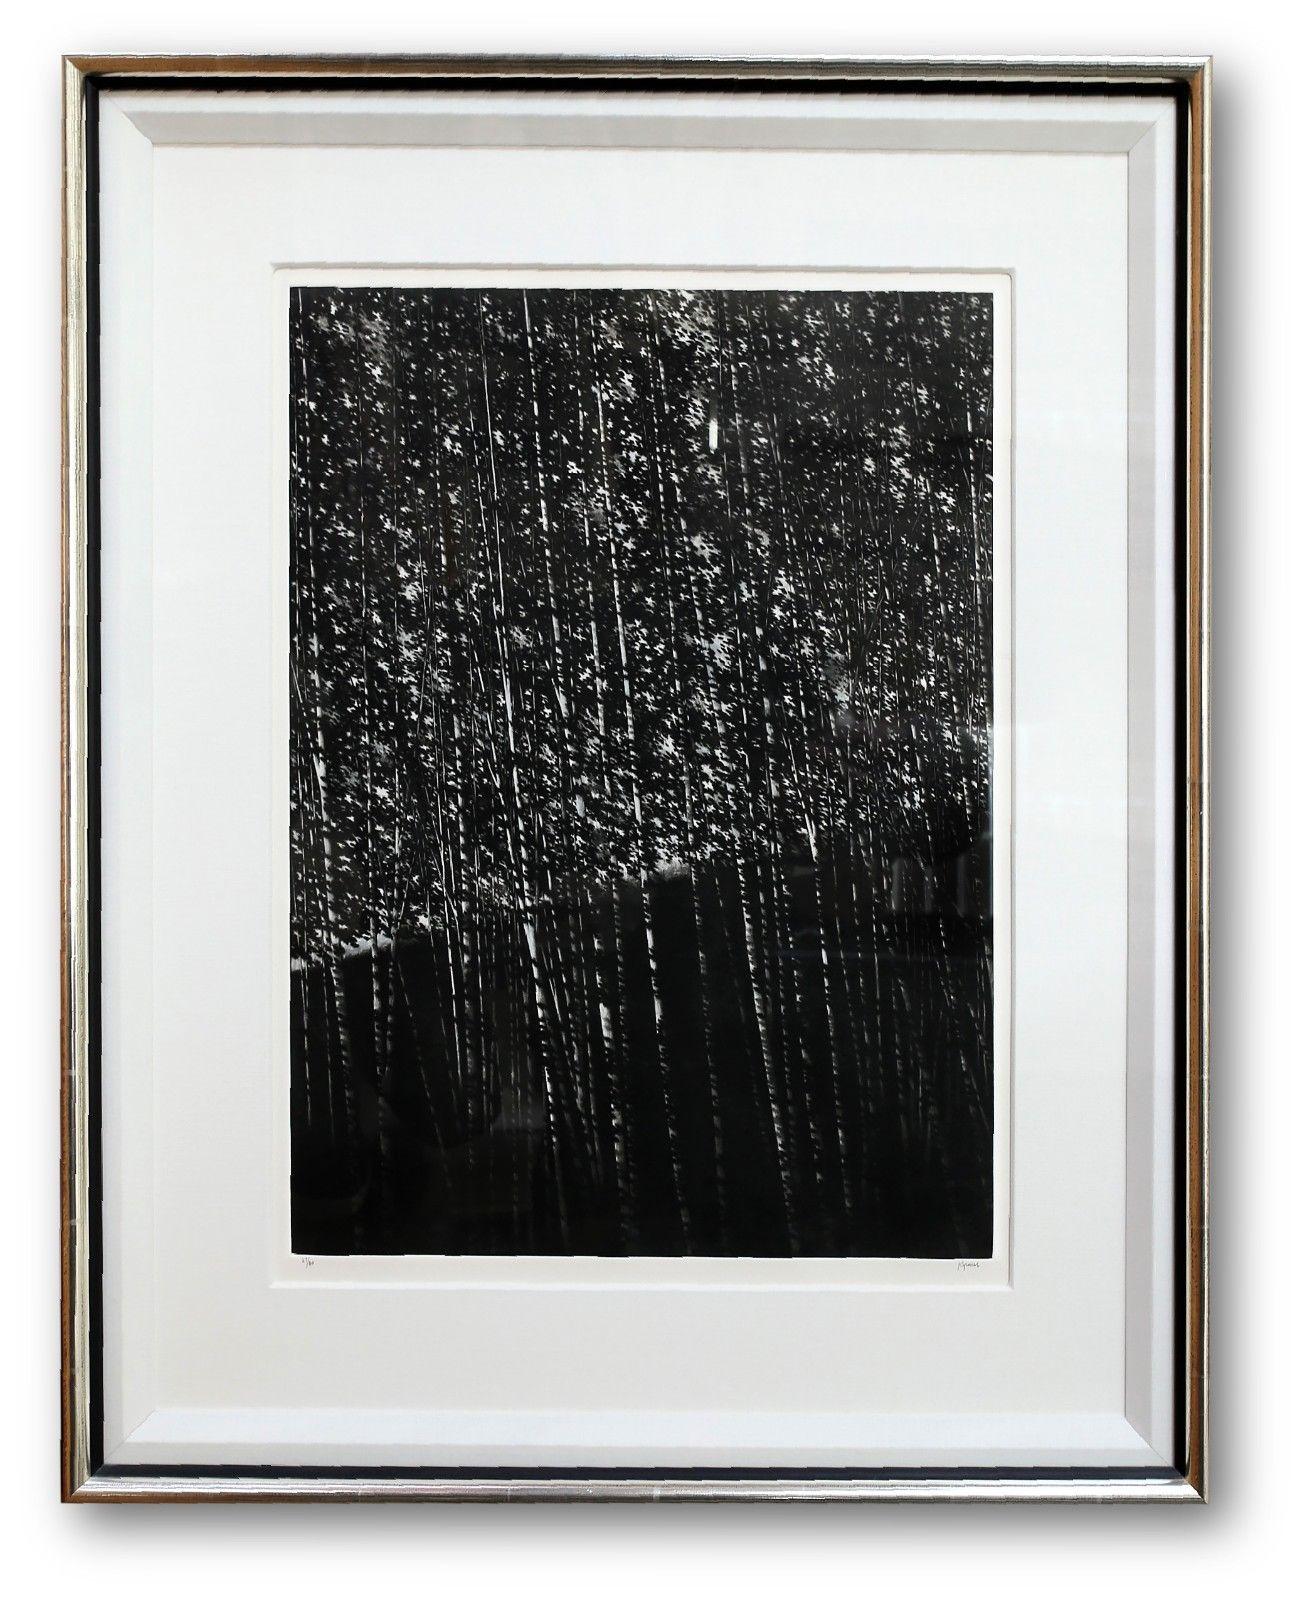 The White Forest artwork by Robert Kipniss - art listed for sale on Artplode